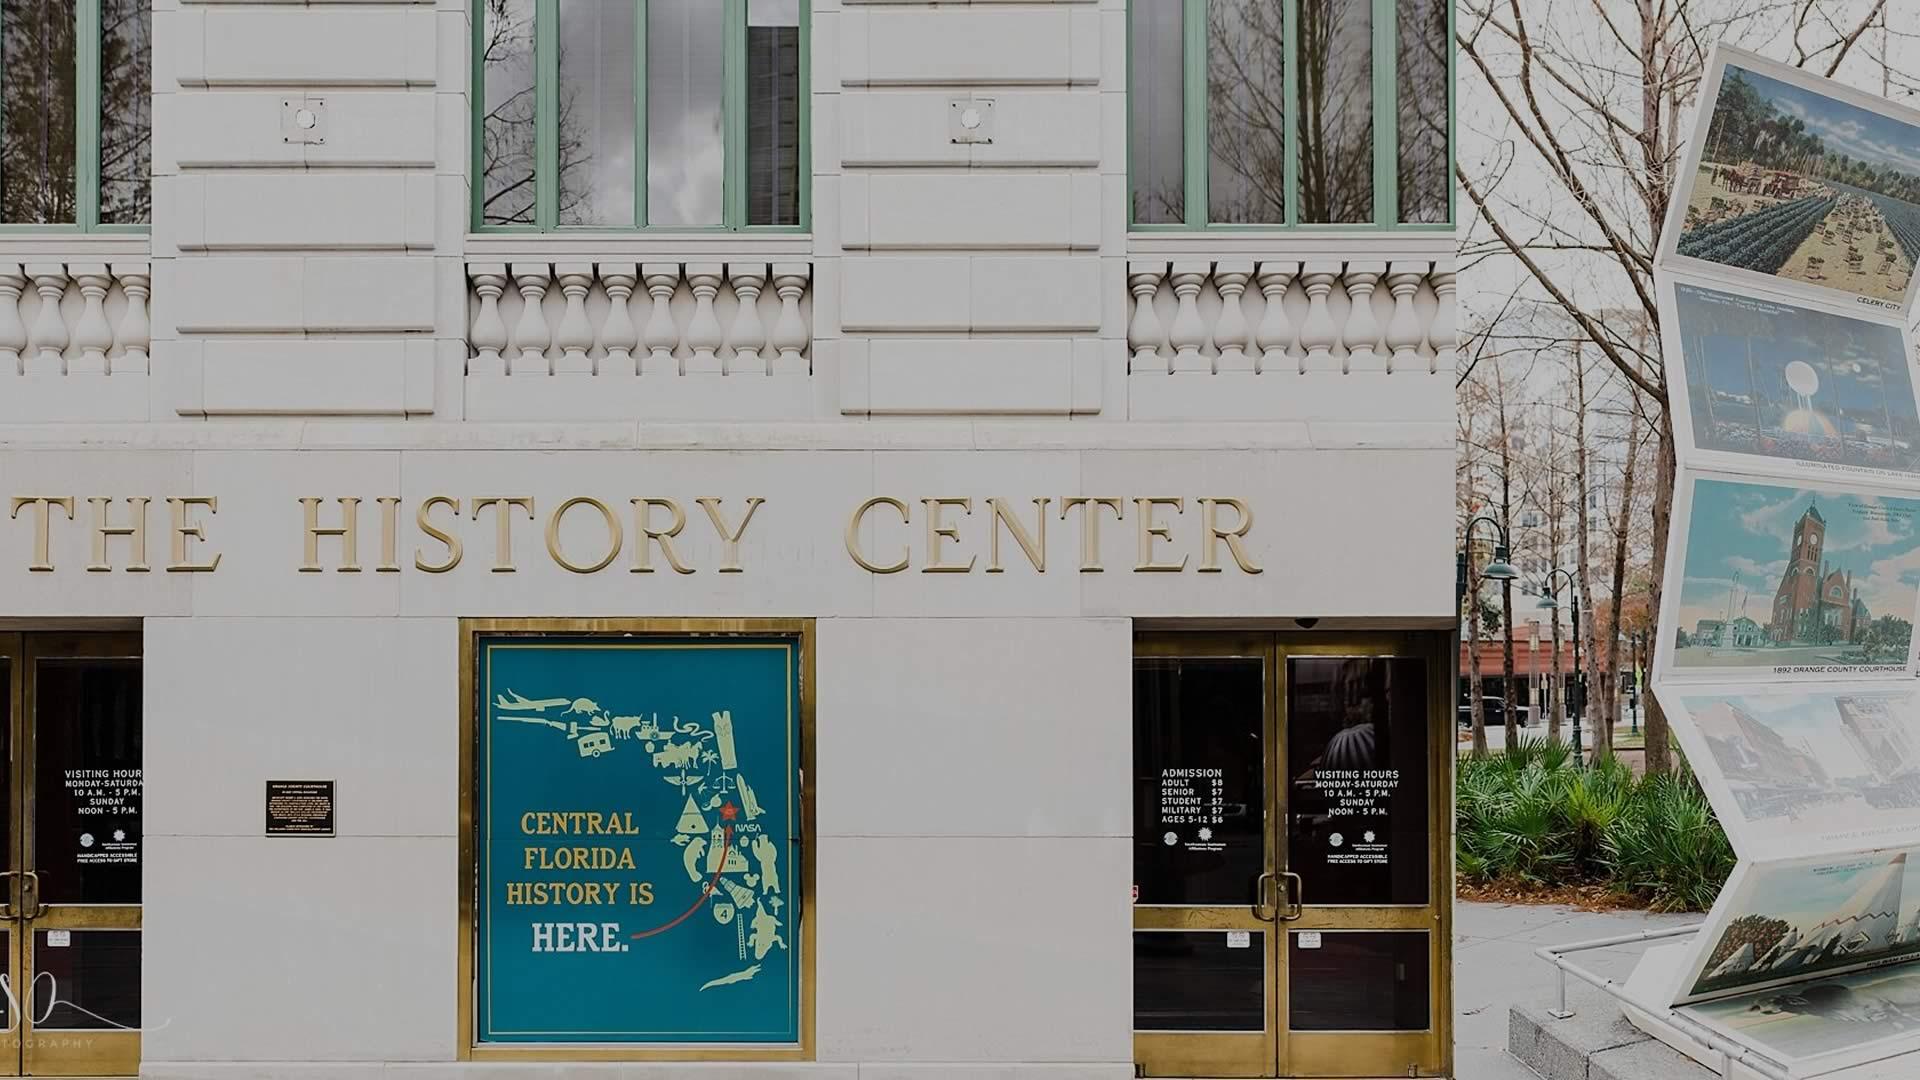 Orange County History Center 1 - Sensational Ceremonies